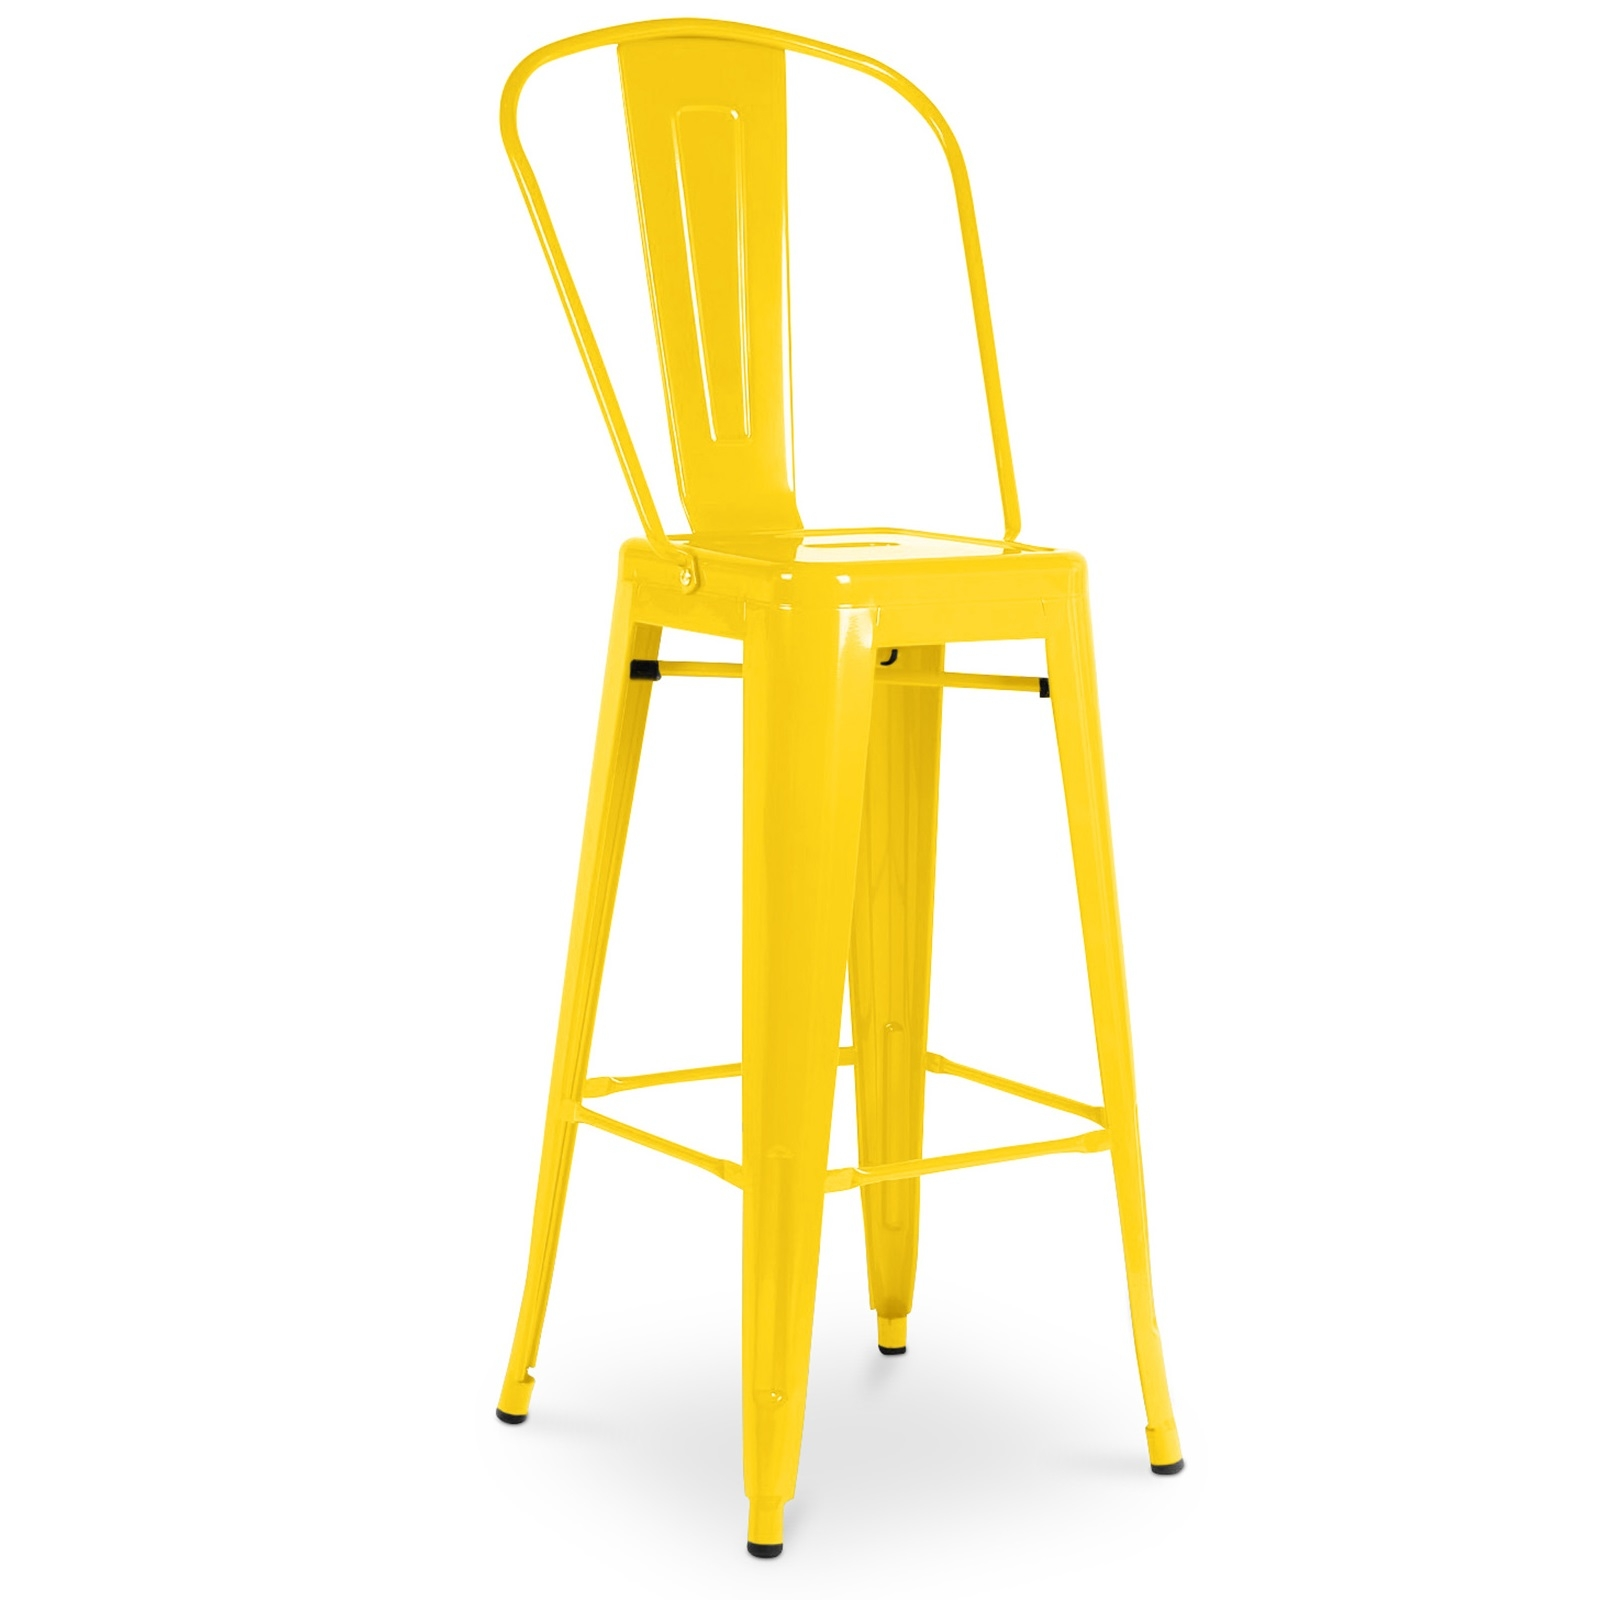 chaise haute m tal brillant jaune h 60 industriel. Black Bedroom Furniture Sets. Home Design Ideas